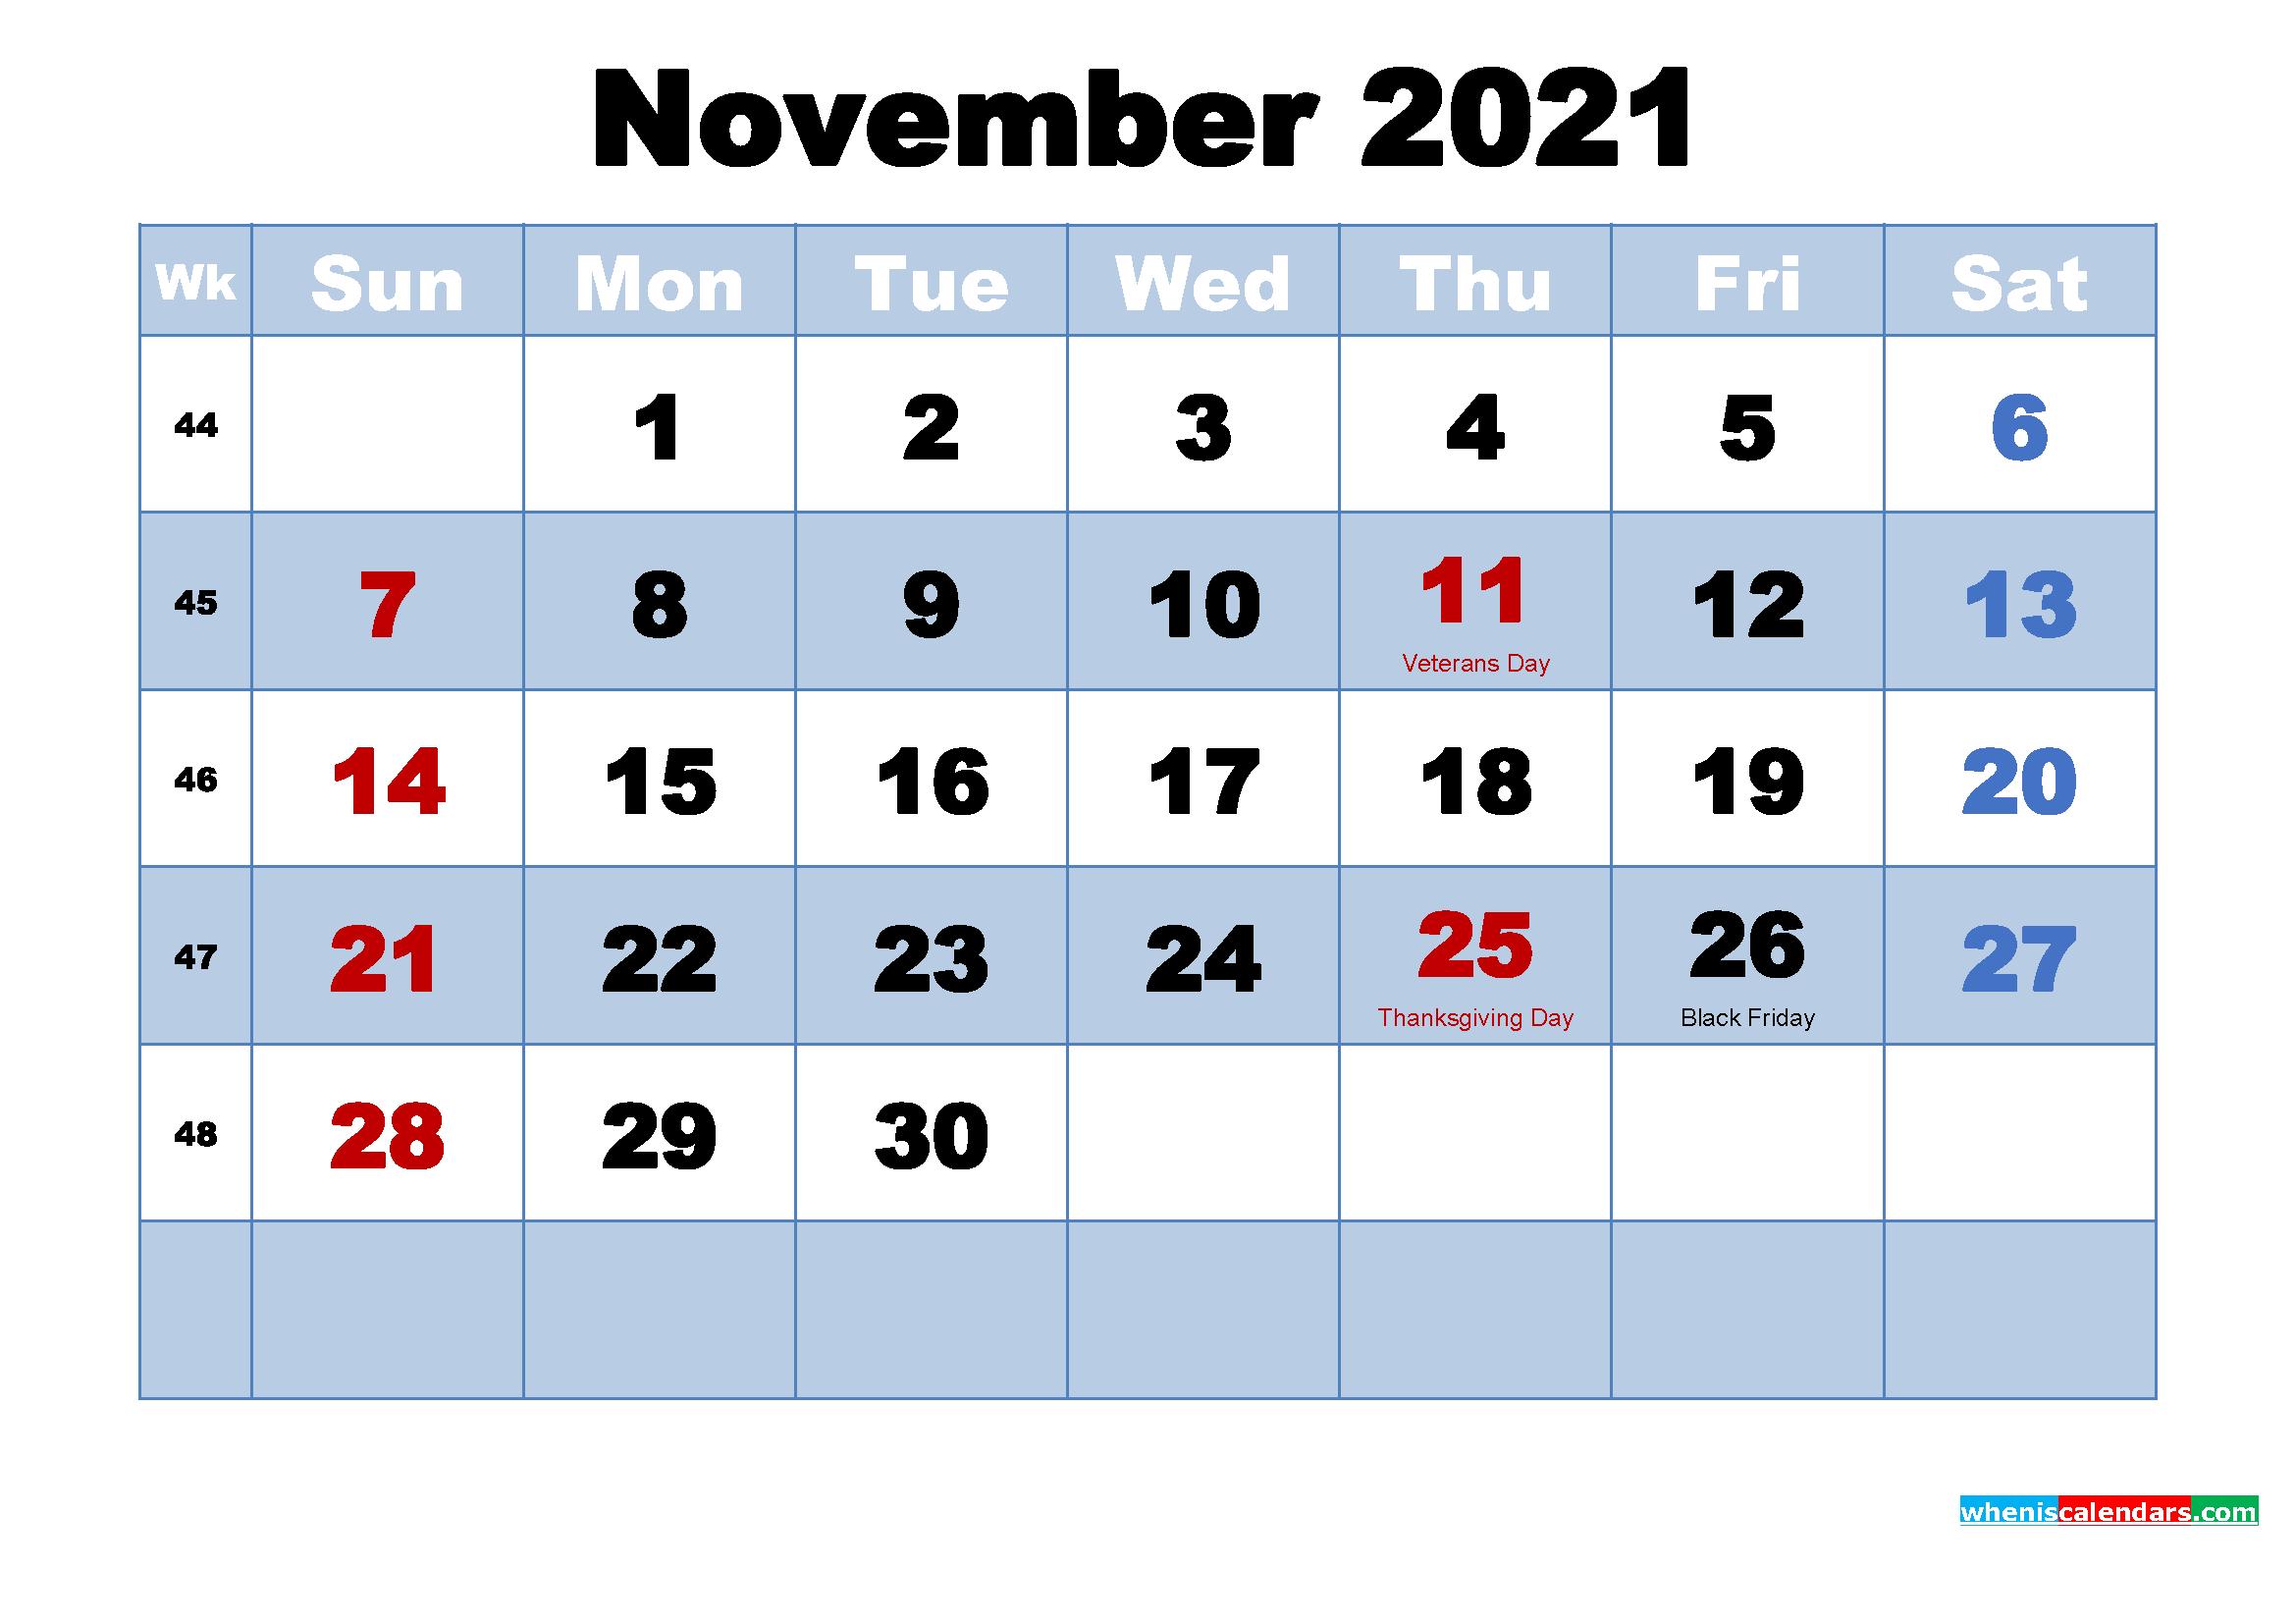 November 2021 Calendar With Holidays Printable - Free